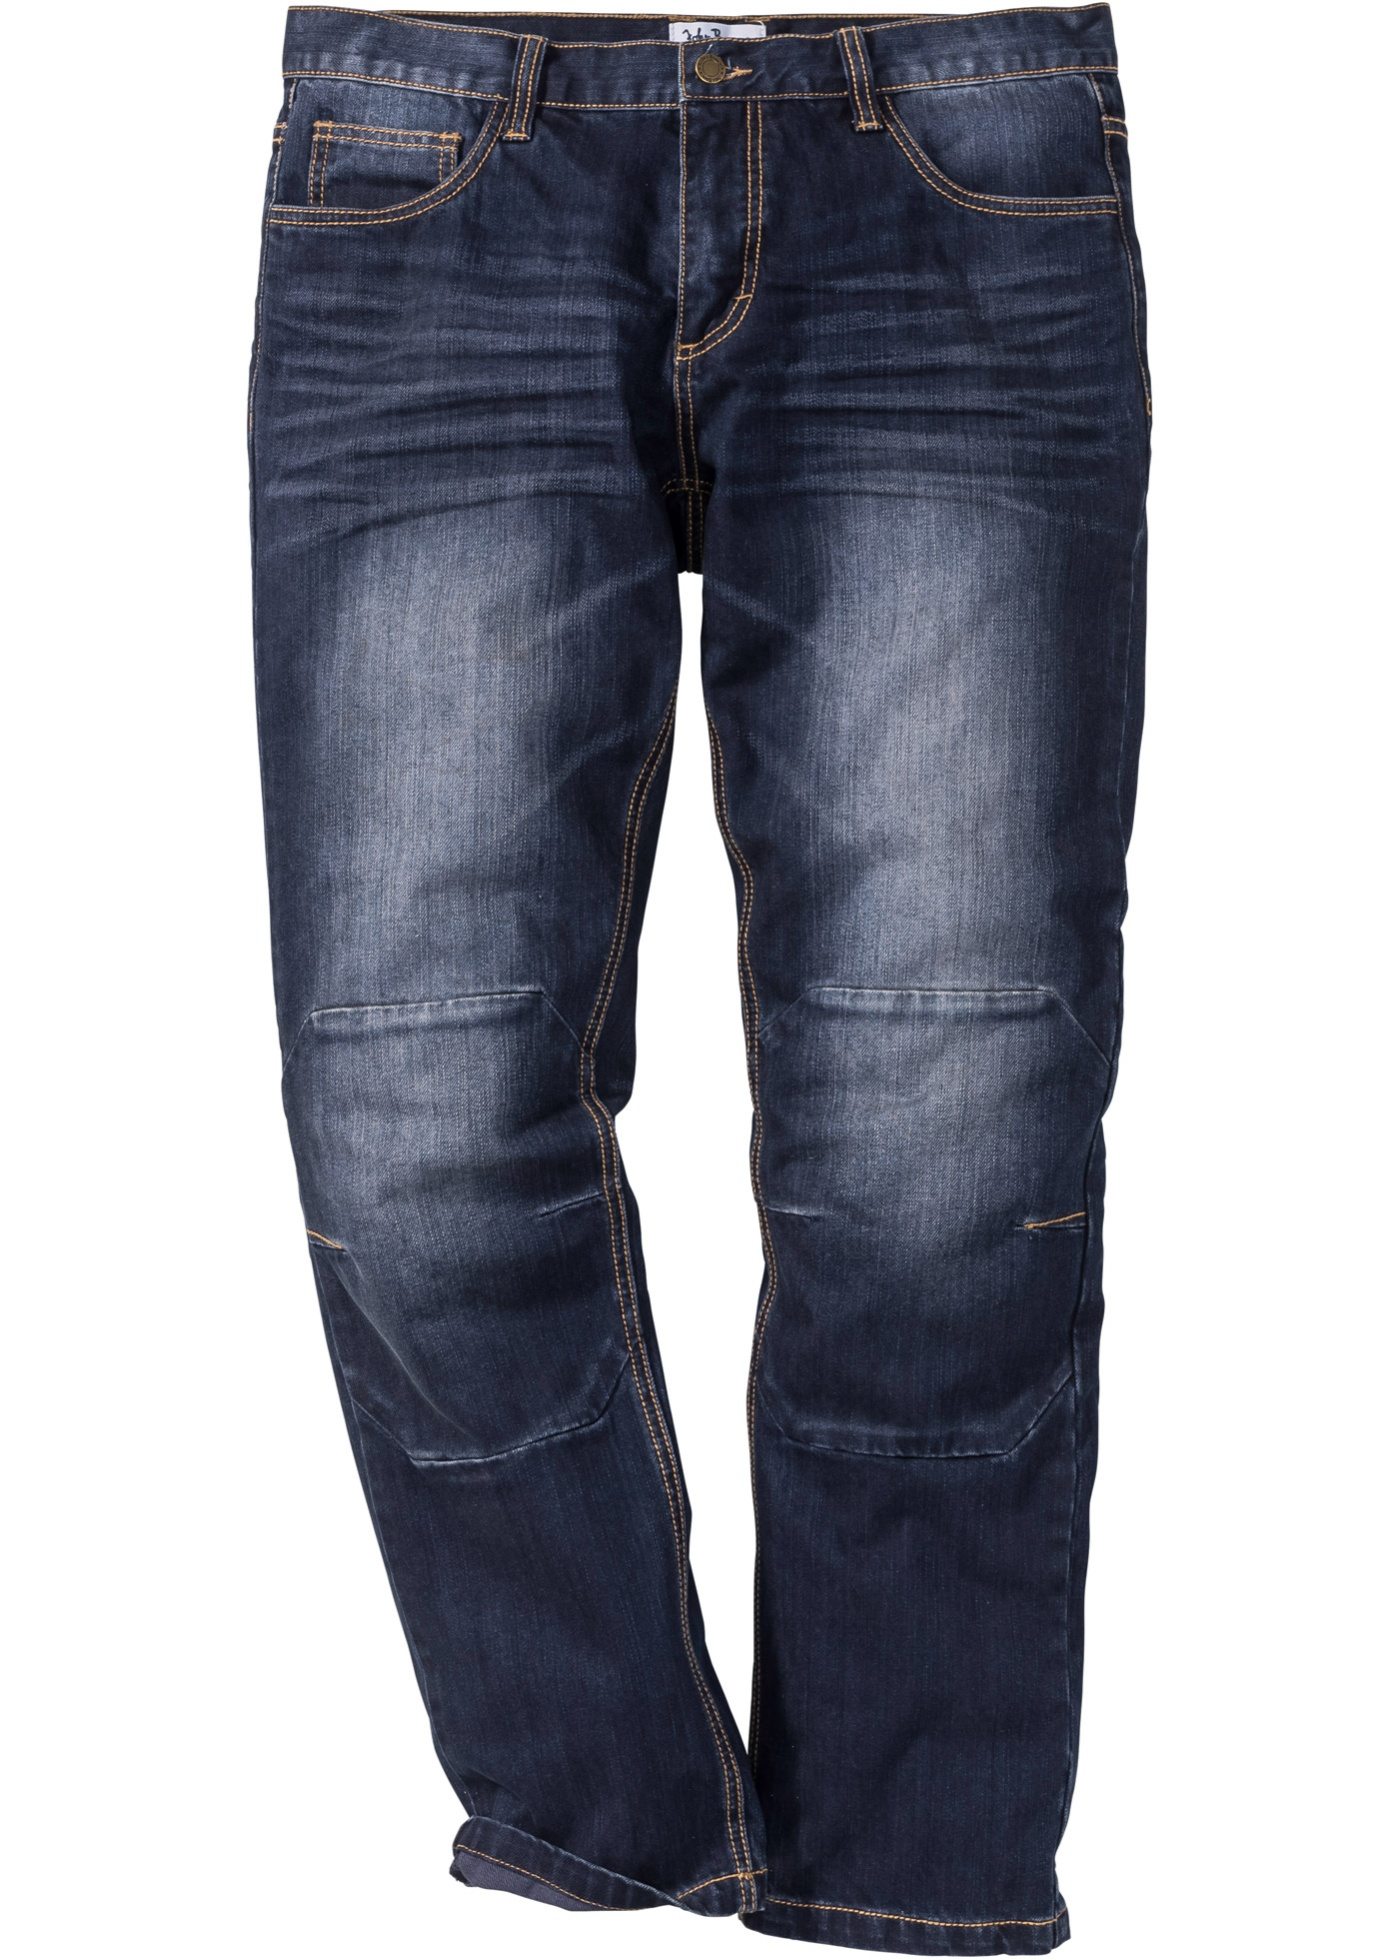 Bonprix SE - Jeans, ledig passform, raka ben 299.00